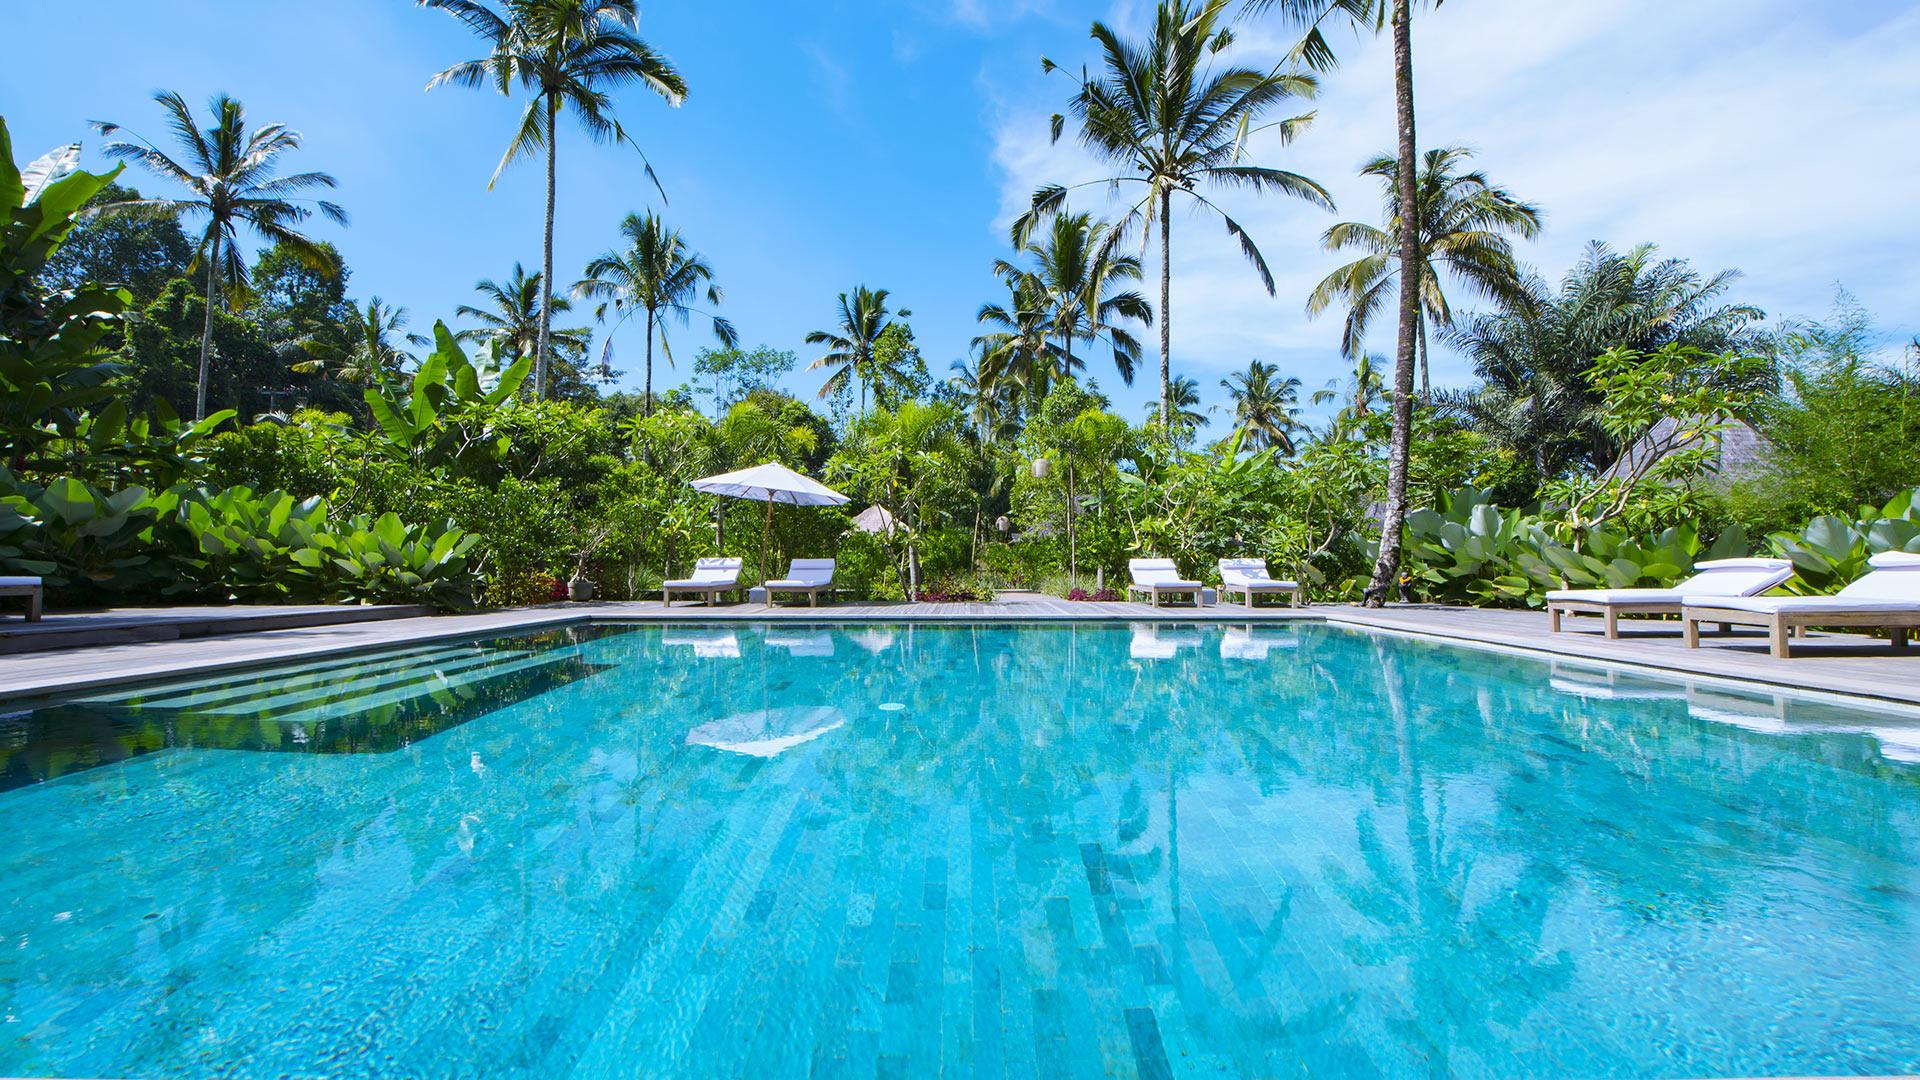 Villa Villa Nag Shampa, Rental in Bali